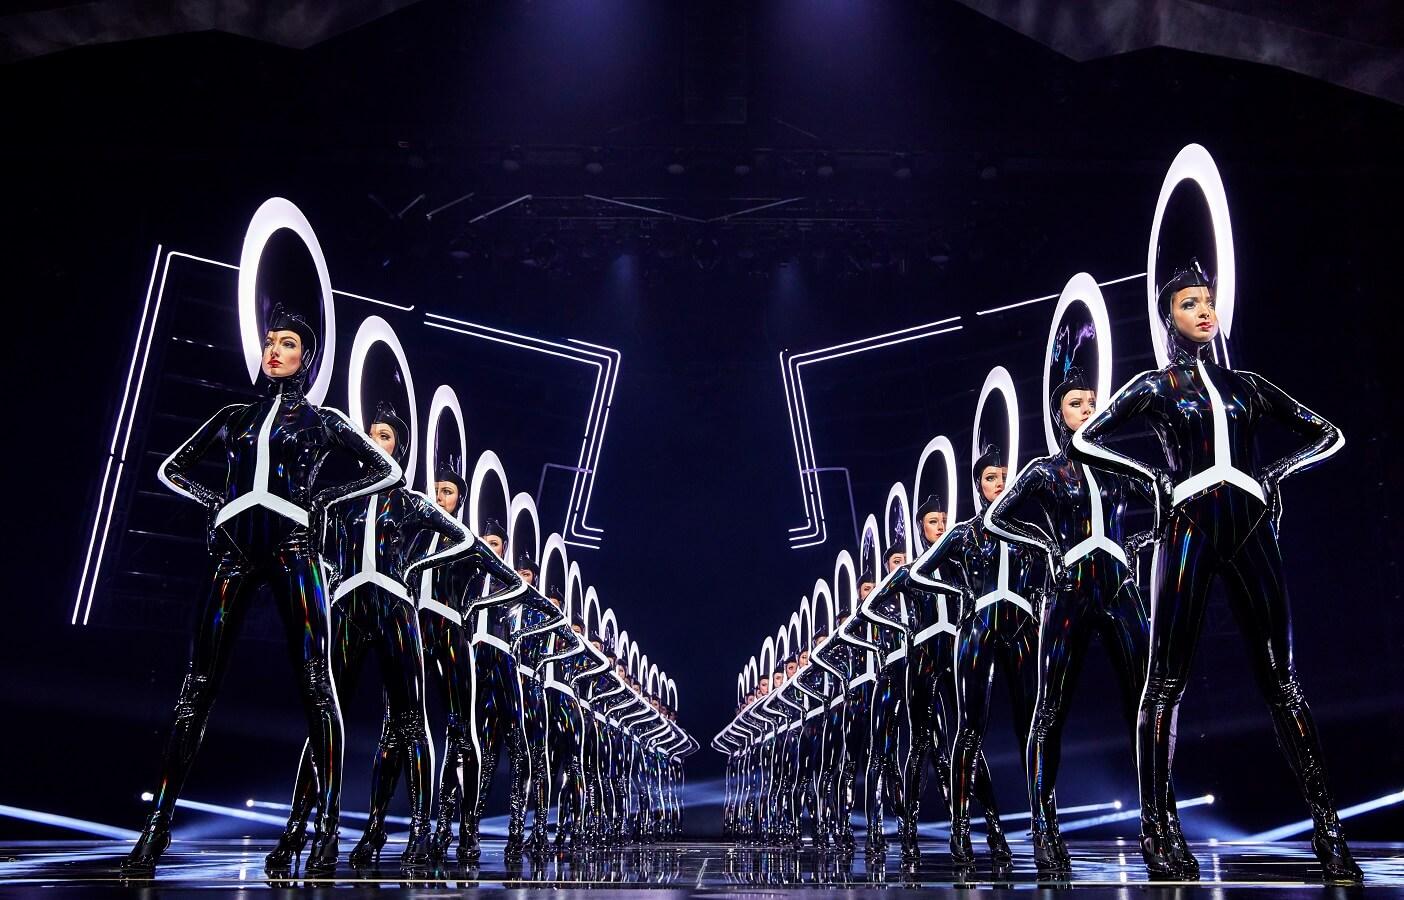 VIVID Grand Show | Kickline